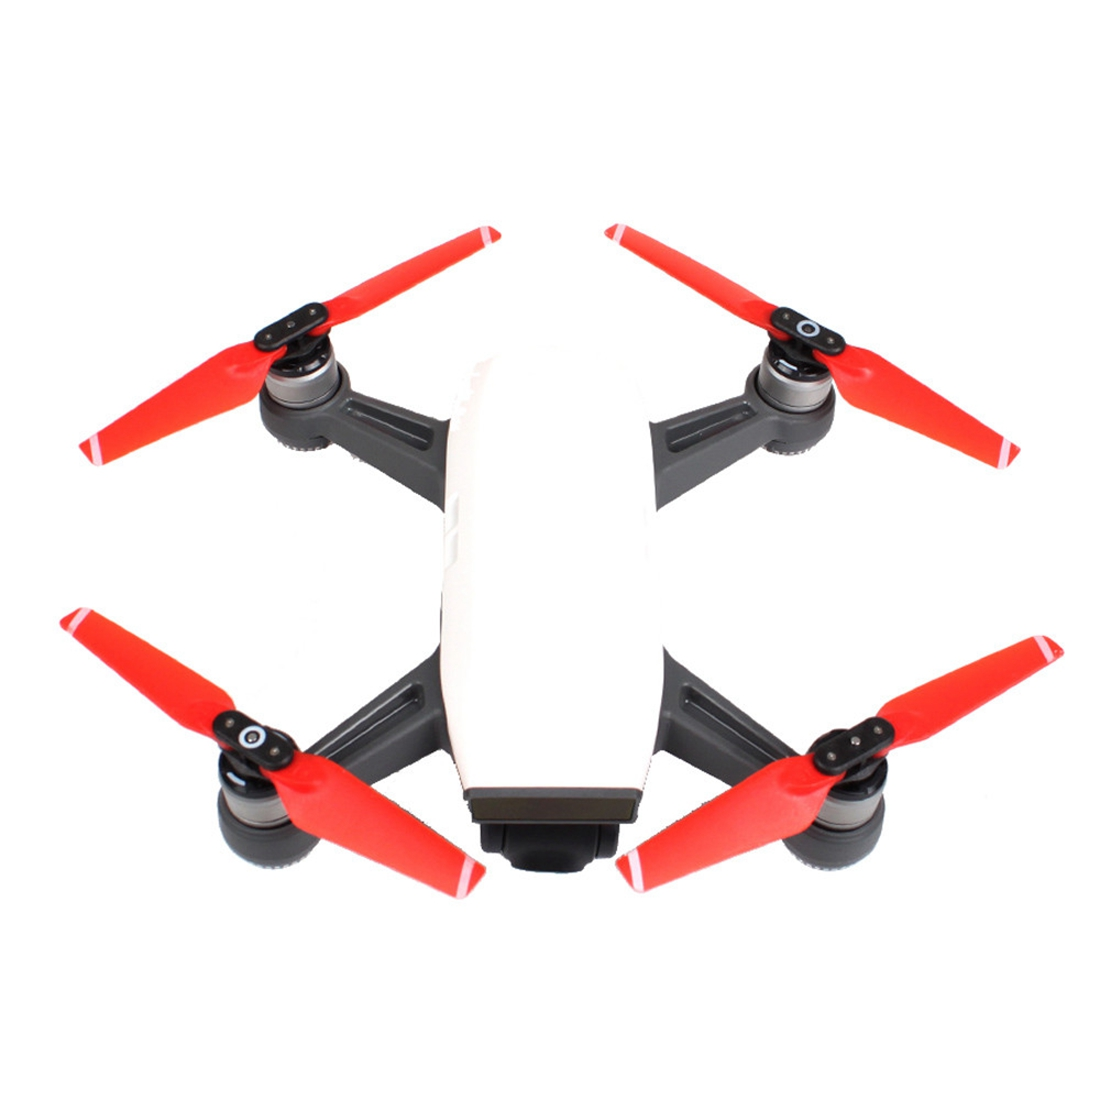 2 par 4730f cuchillas Hélices de liberación rápida plegable plástico Hélices S para DJI Spark RC drone Accesorios